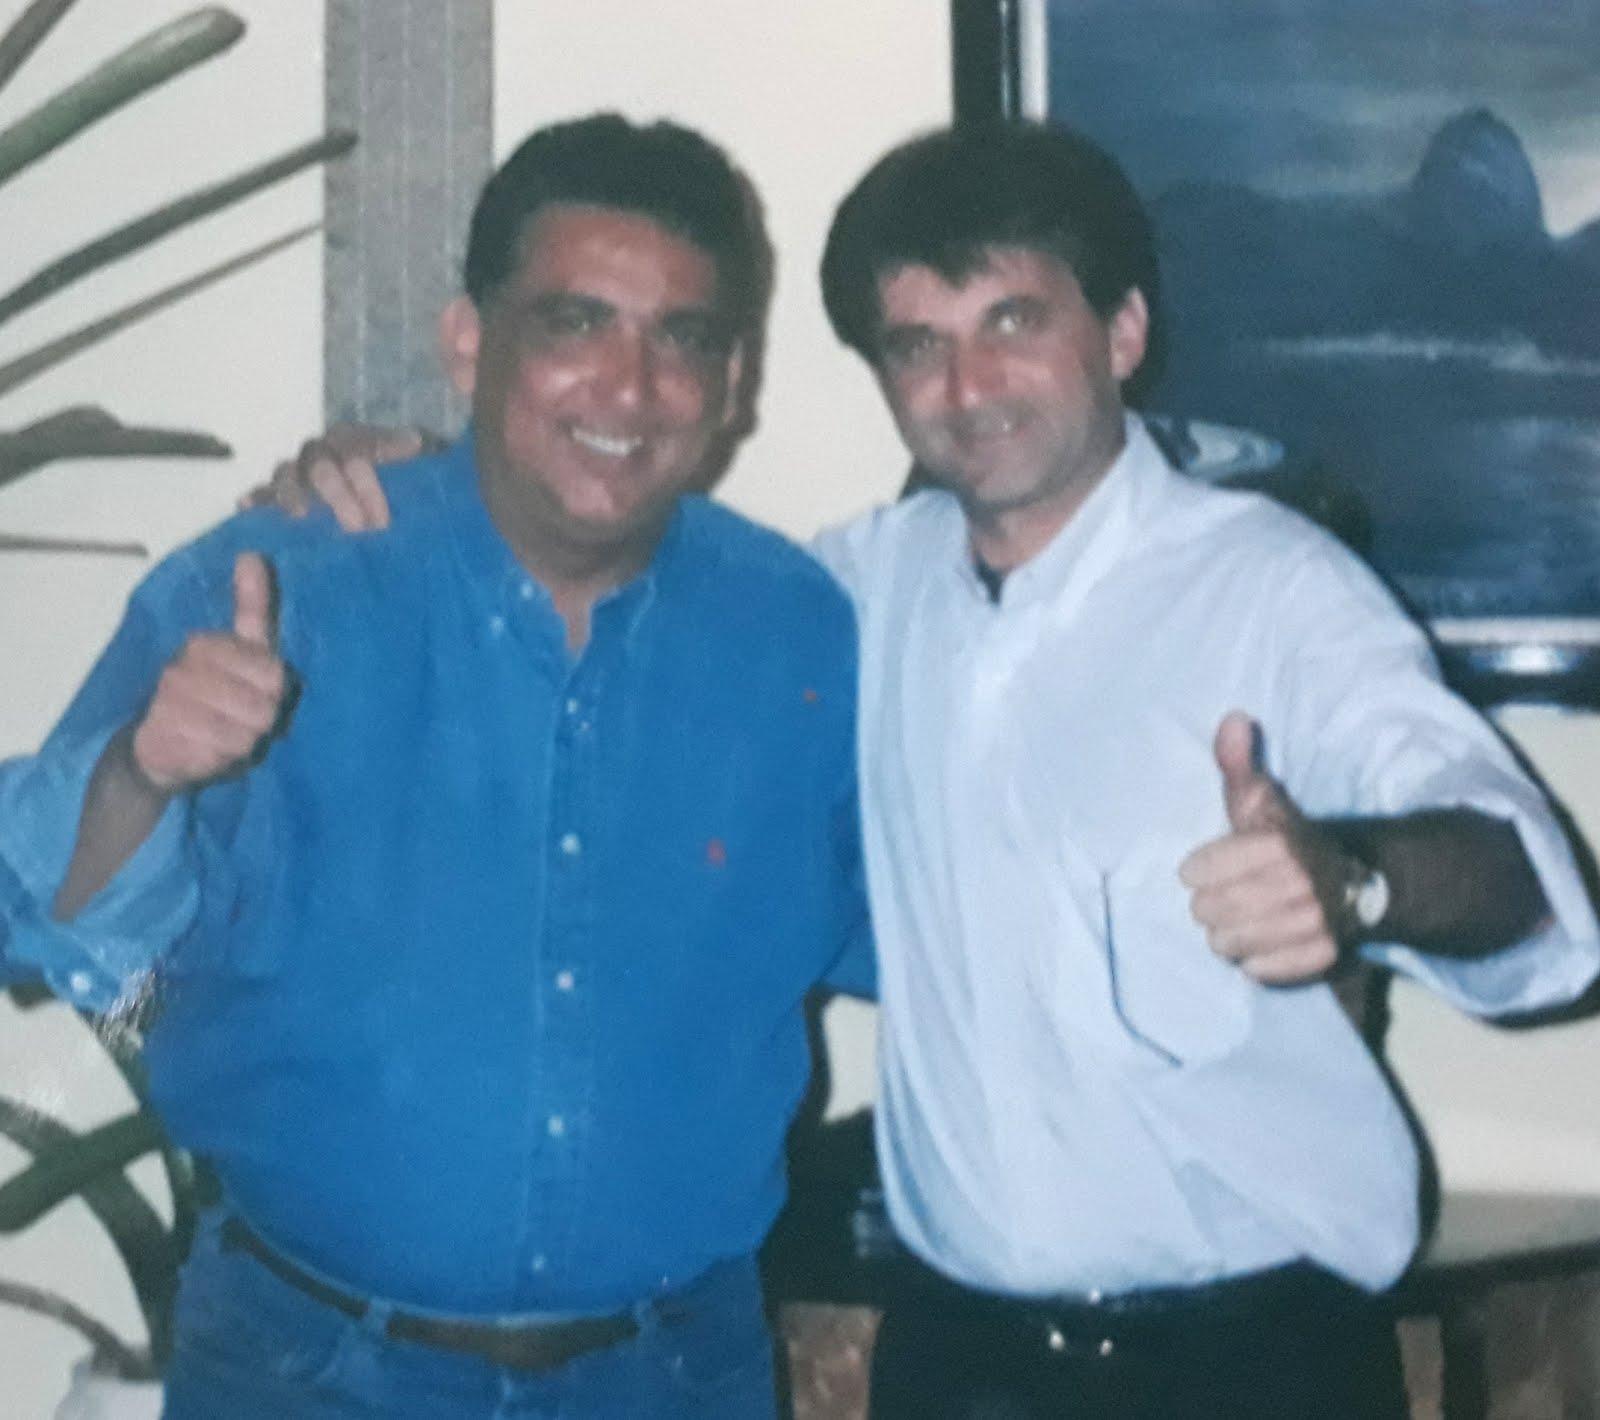 Airton Engster dos Santos e Galvão Bueno da Rede Globo